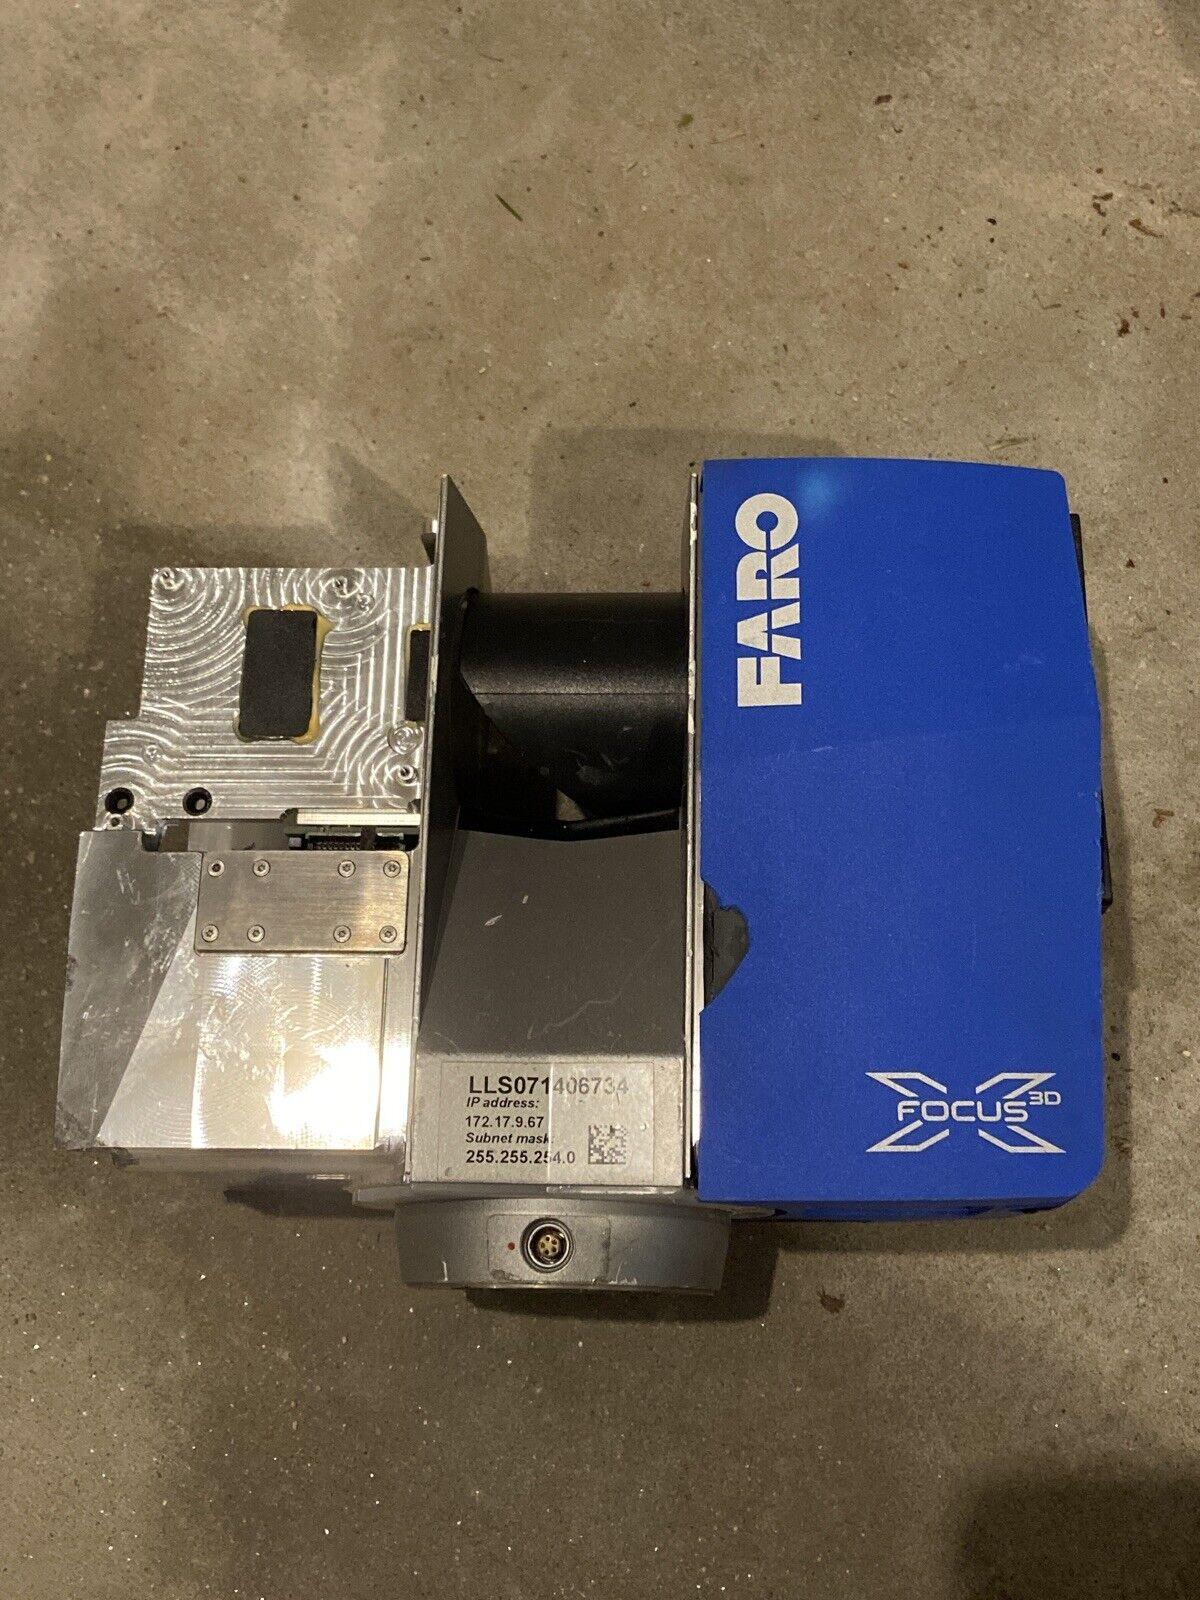 2014 Model Faro Focus3D X330 3D Laser Scanner Focus X 330 PARTS OR REPAIR!